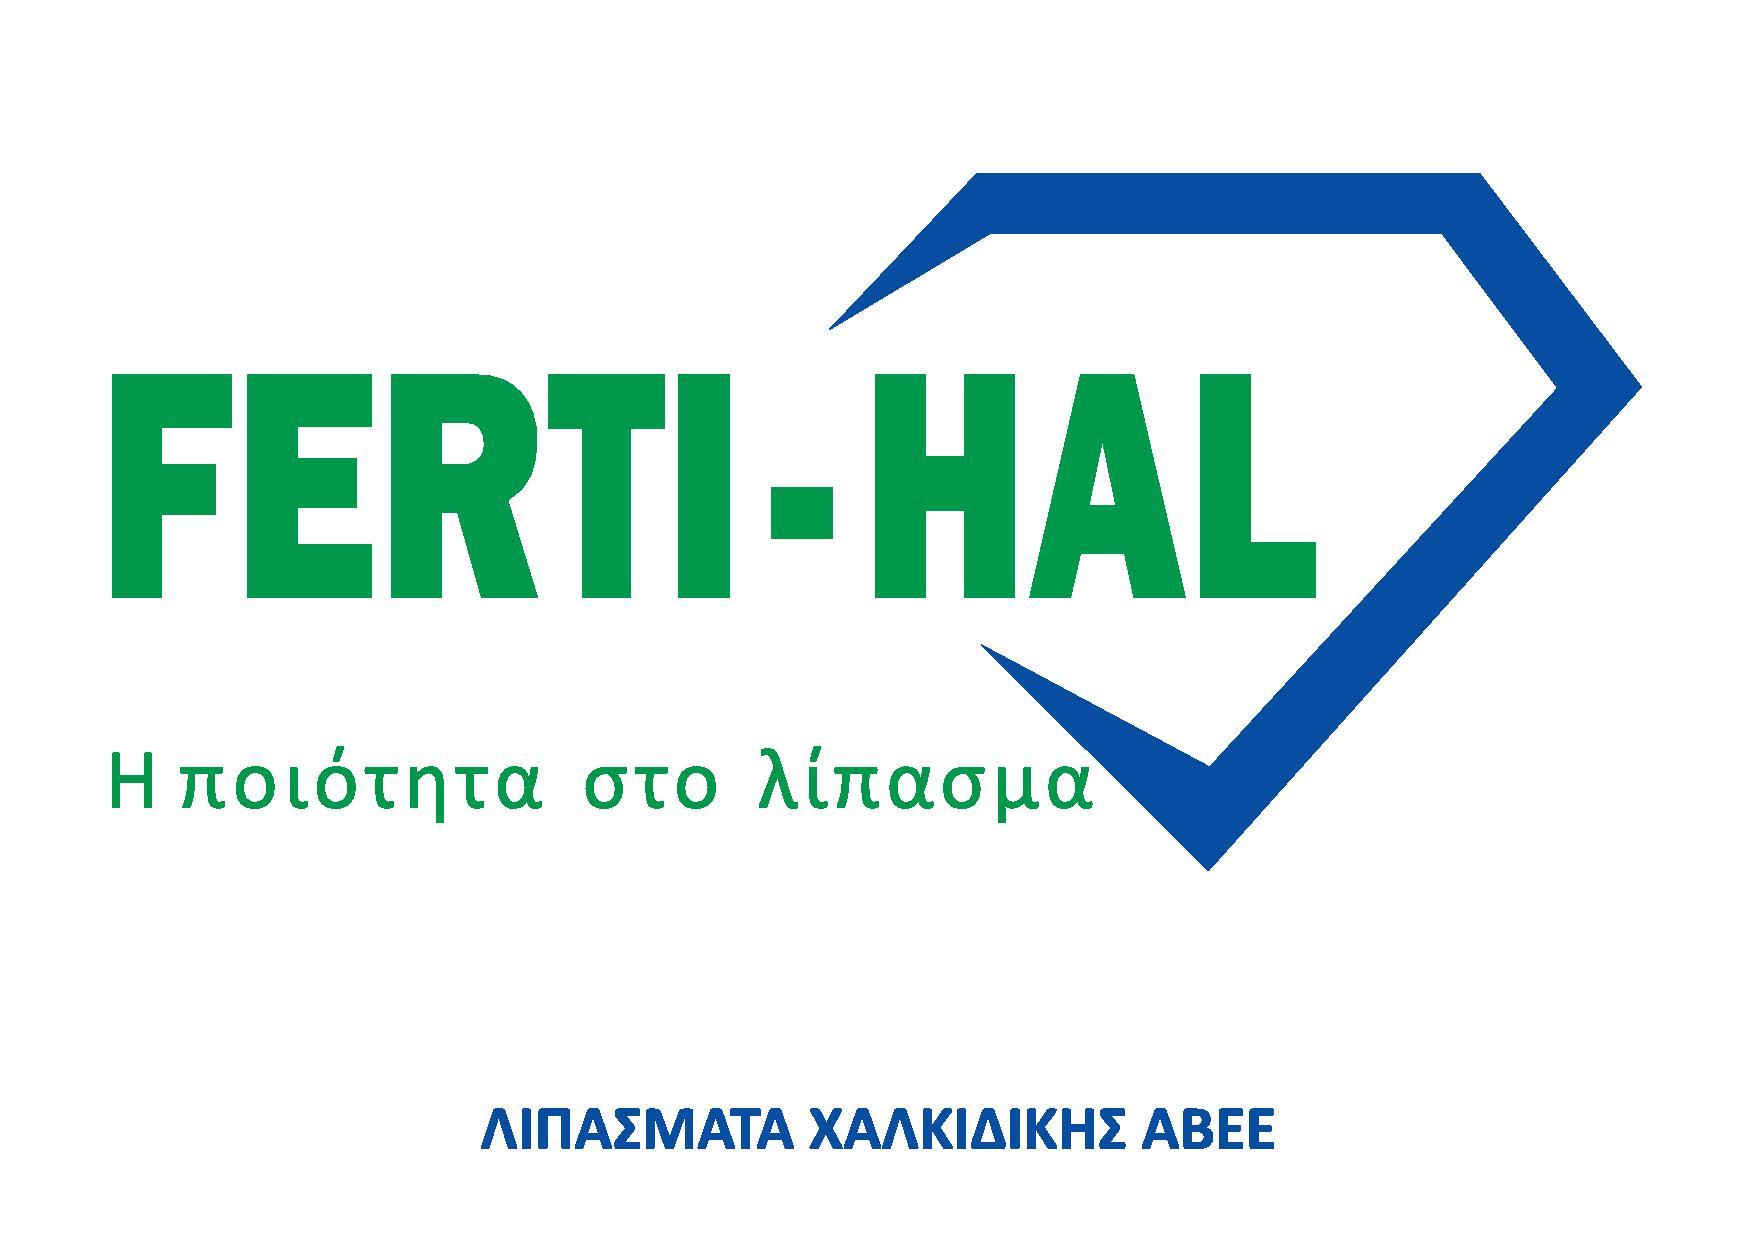 FERTI-HAL